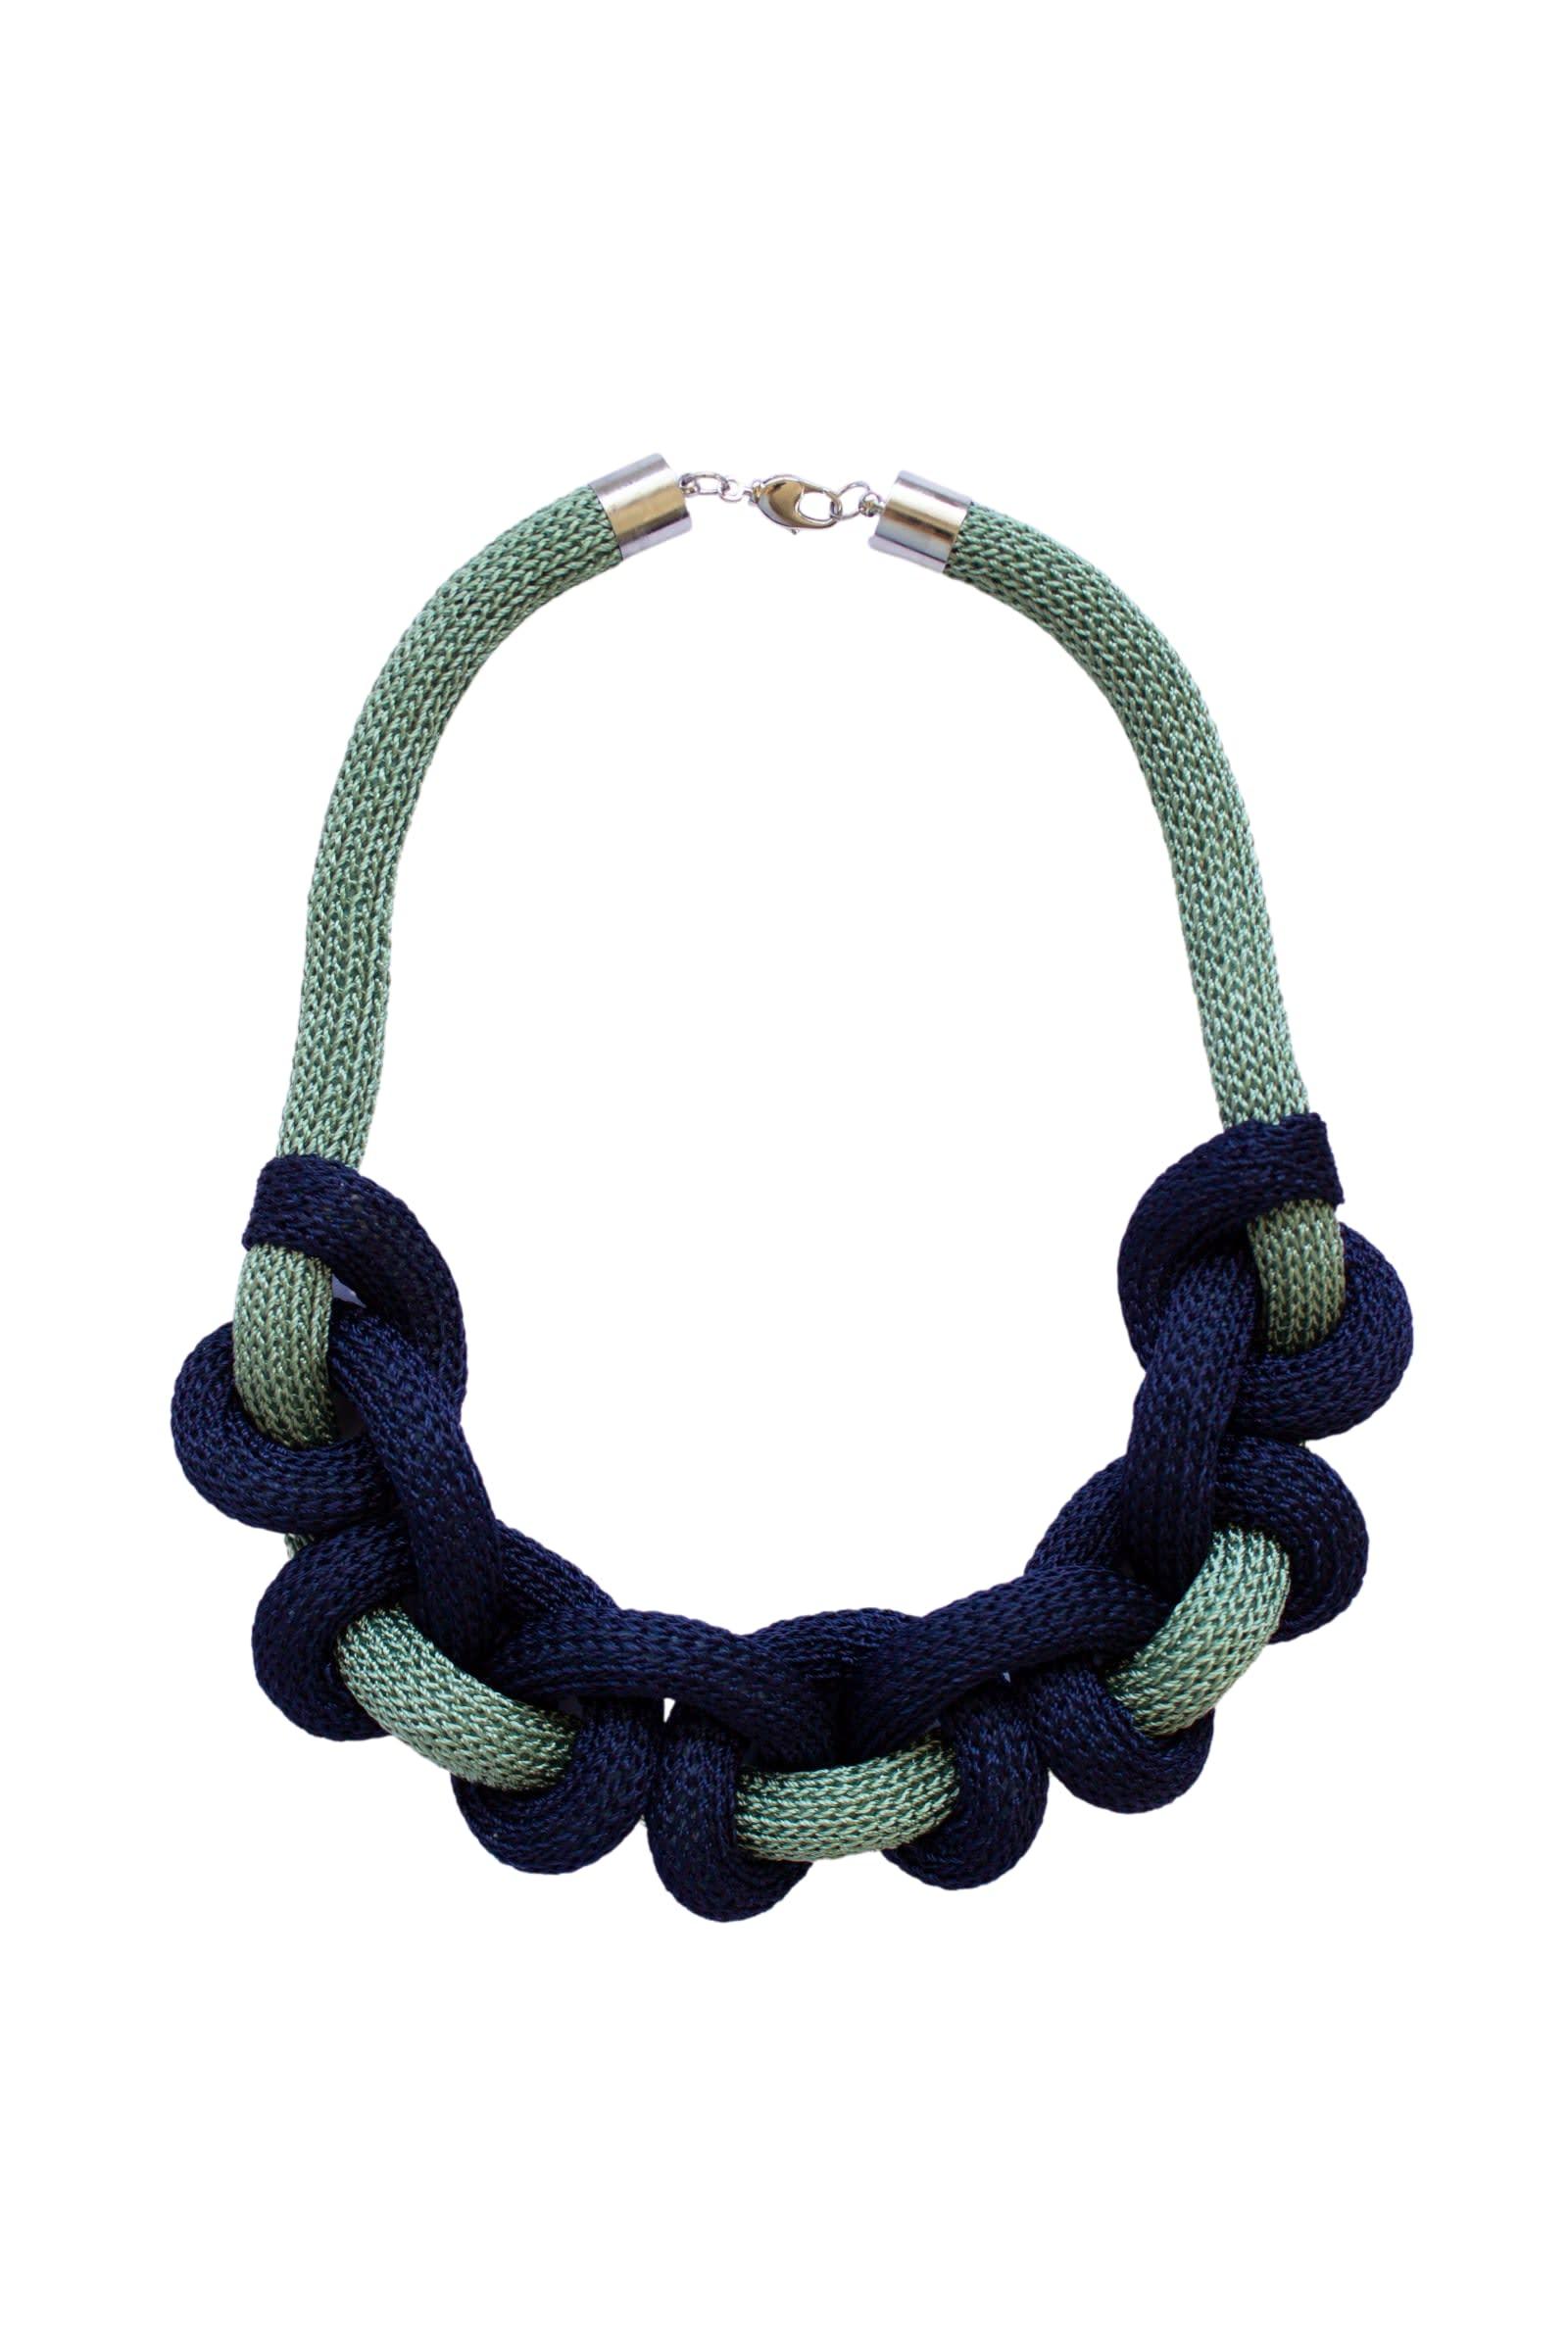 Collar Doris Verde - Azul - Galga